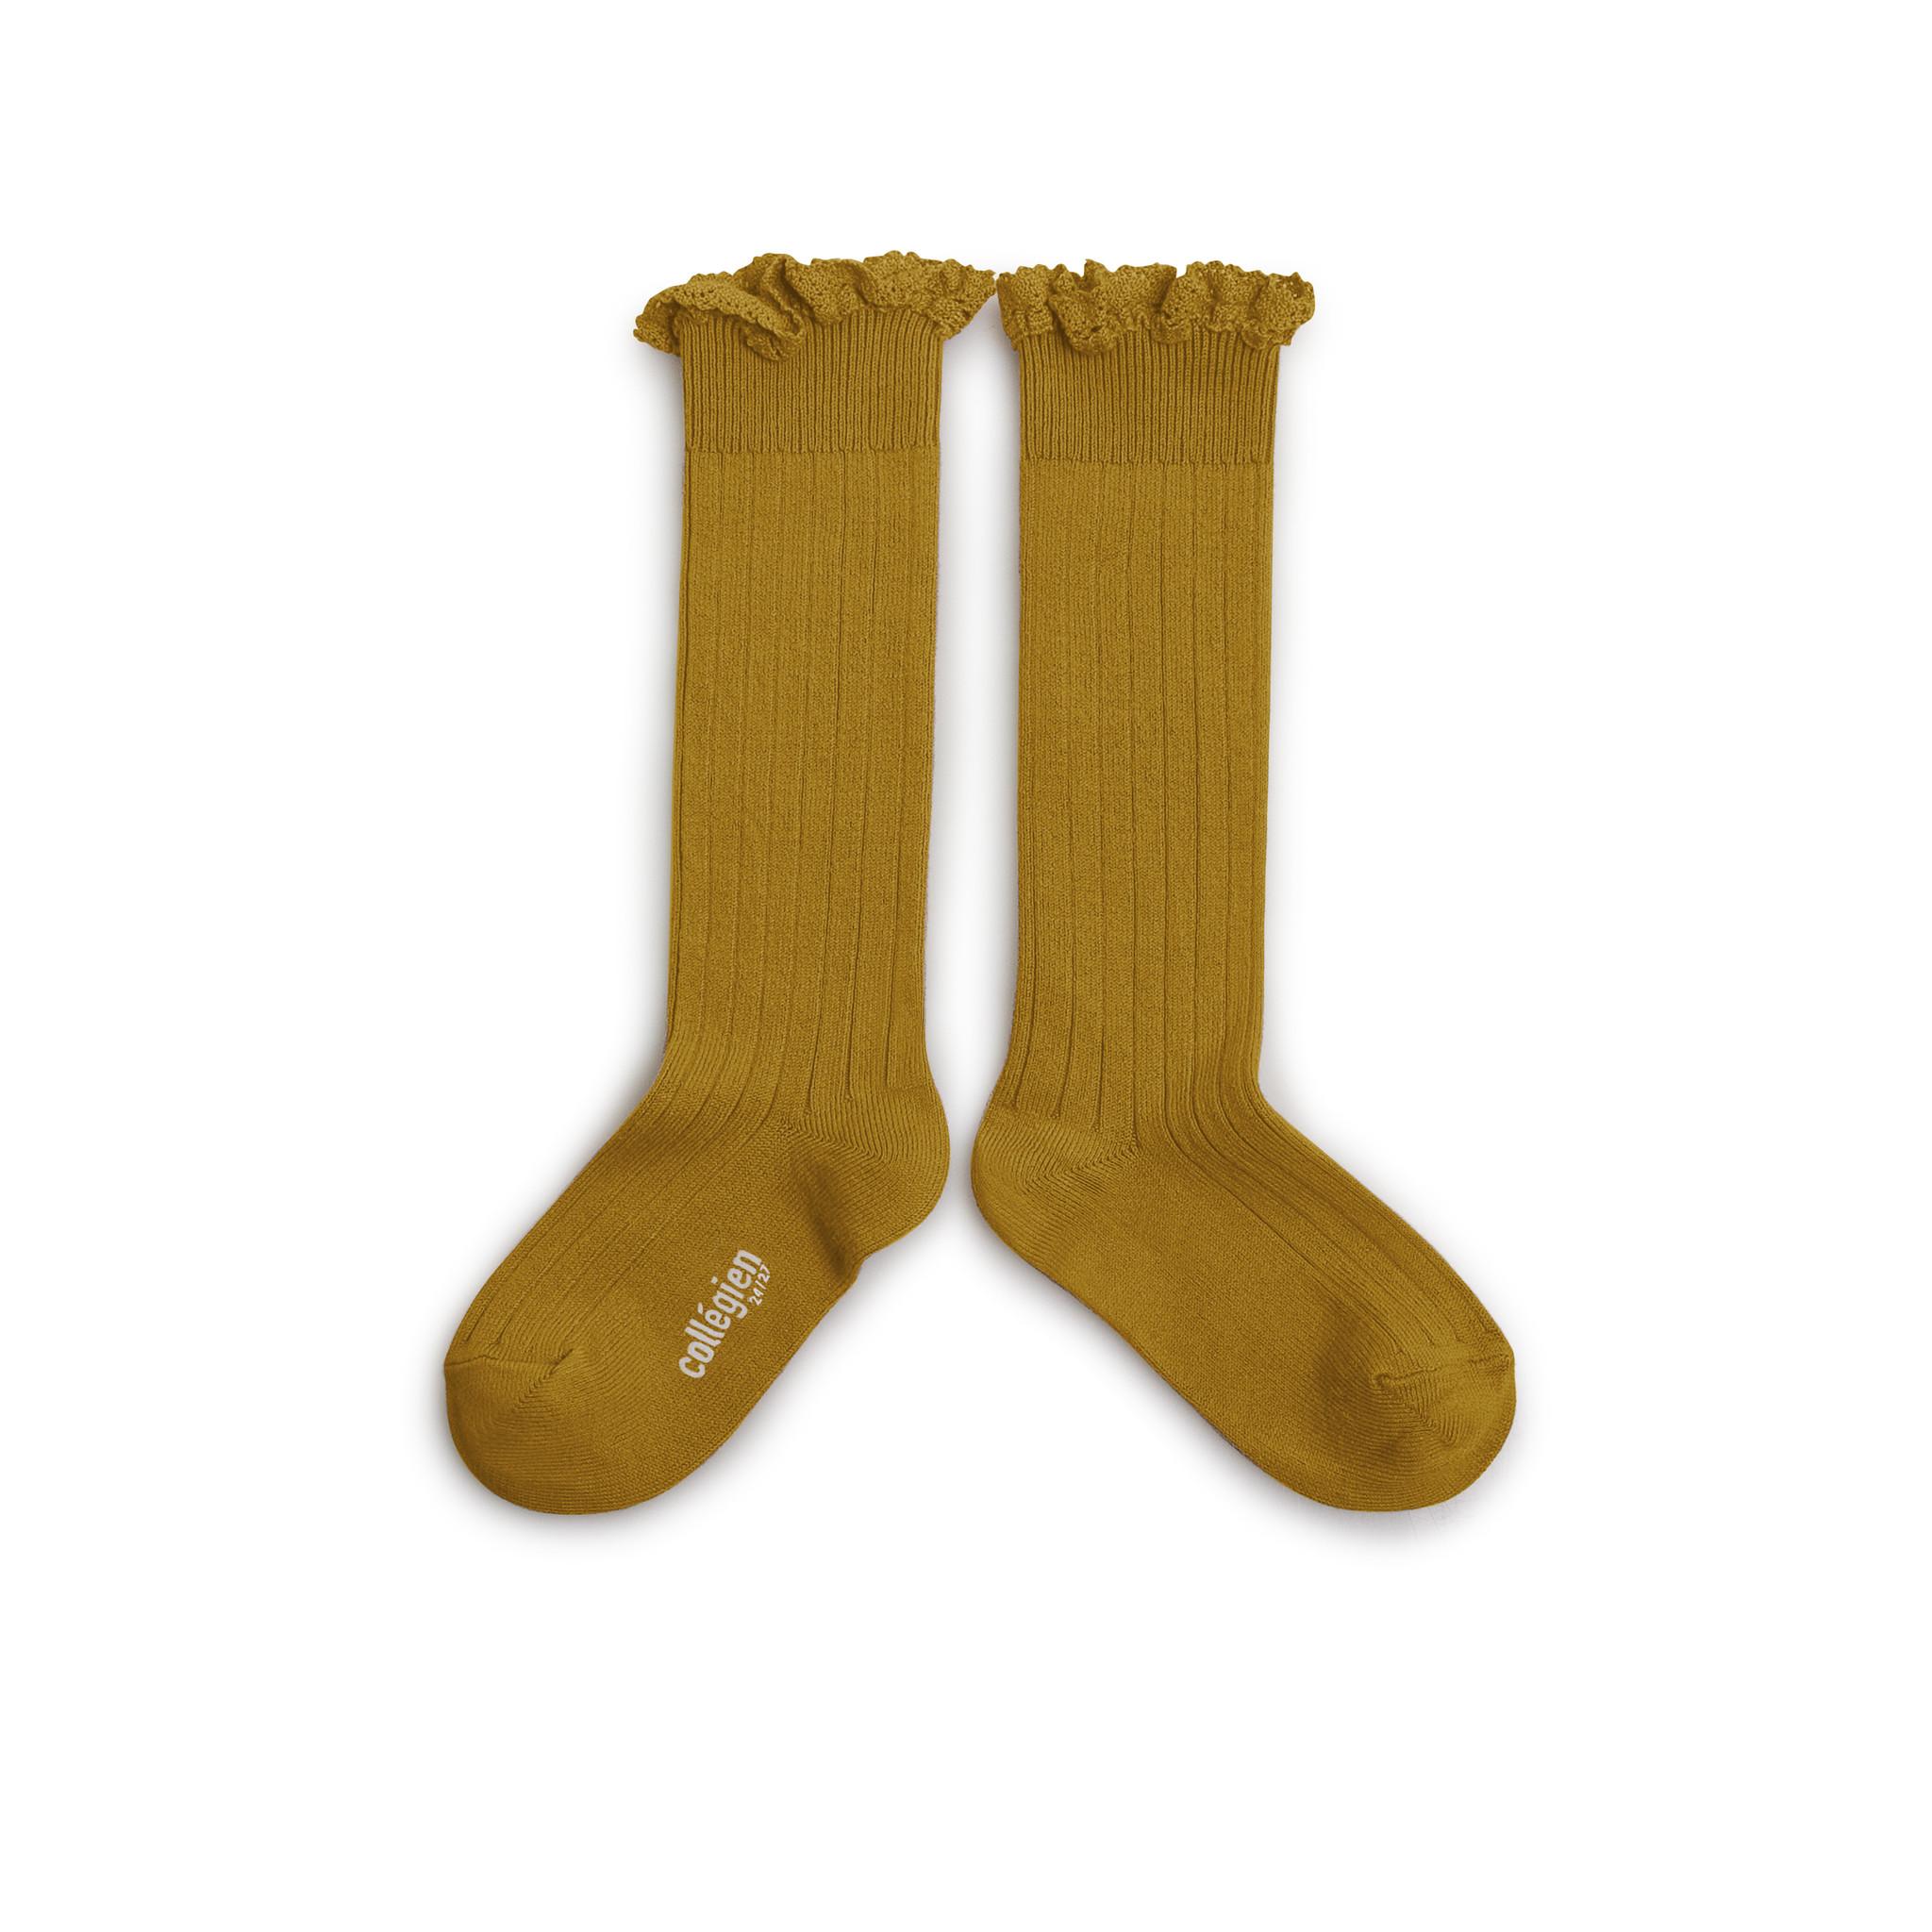 Knee Socks Lace 'Joséphine' Moutarde De Dijon-2